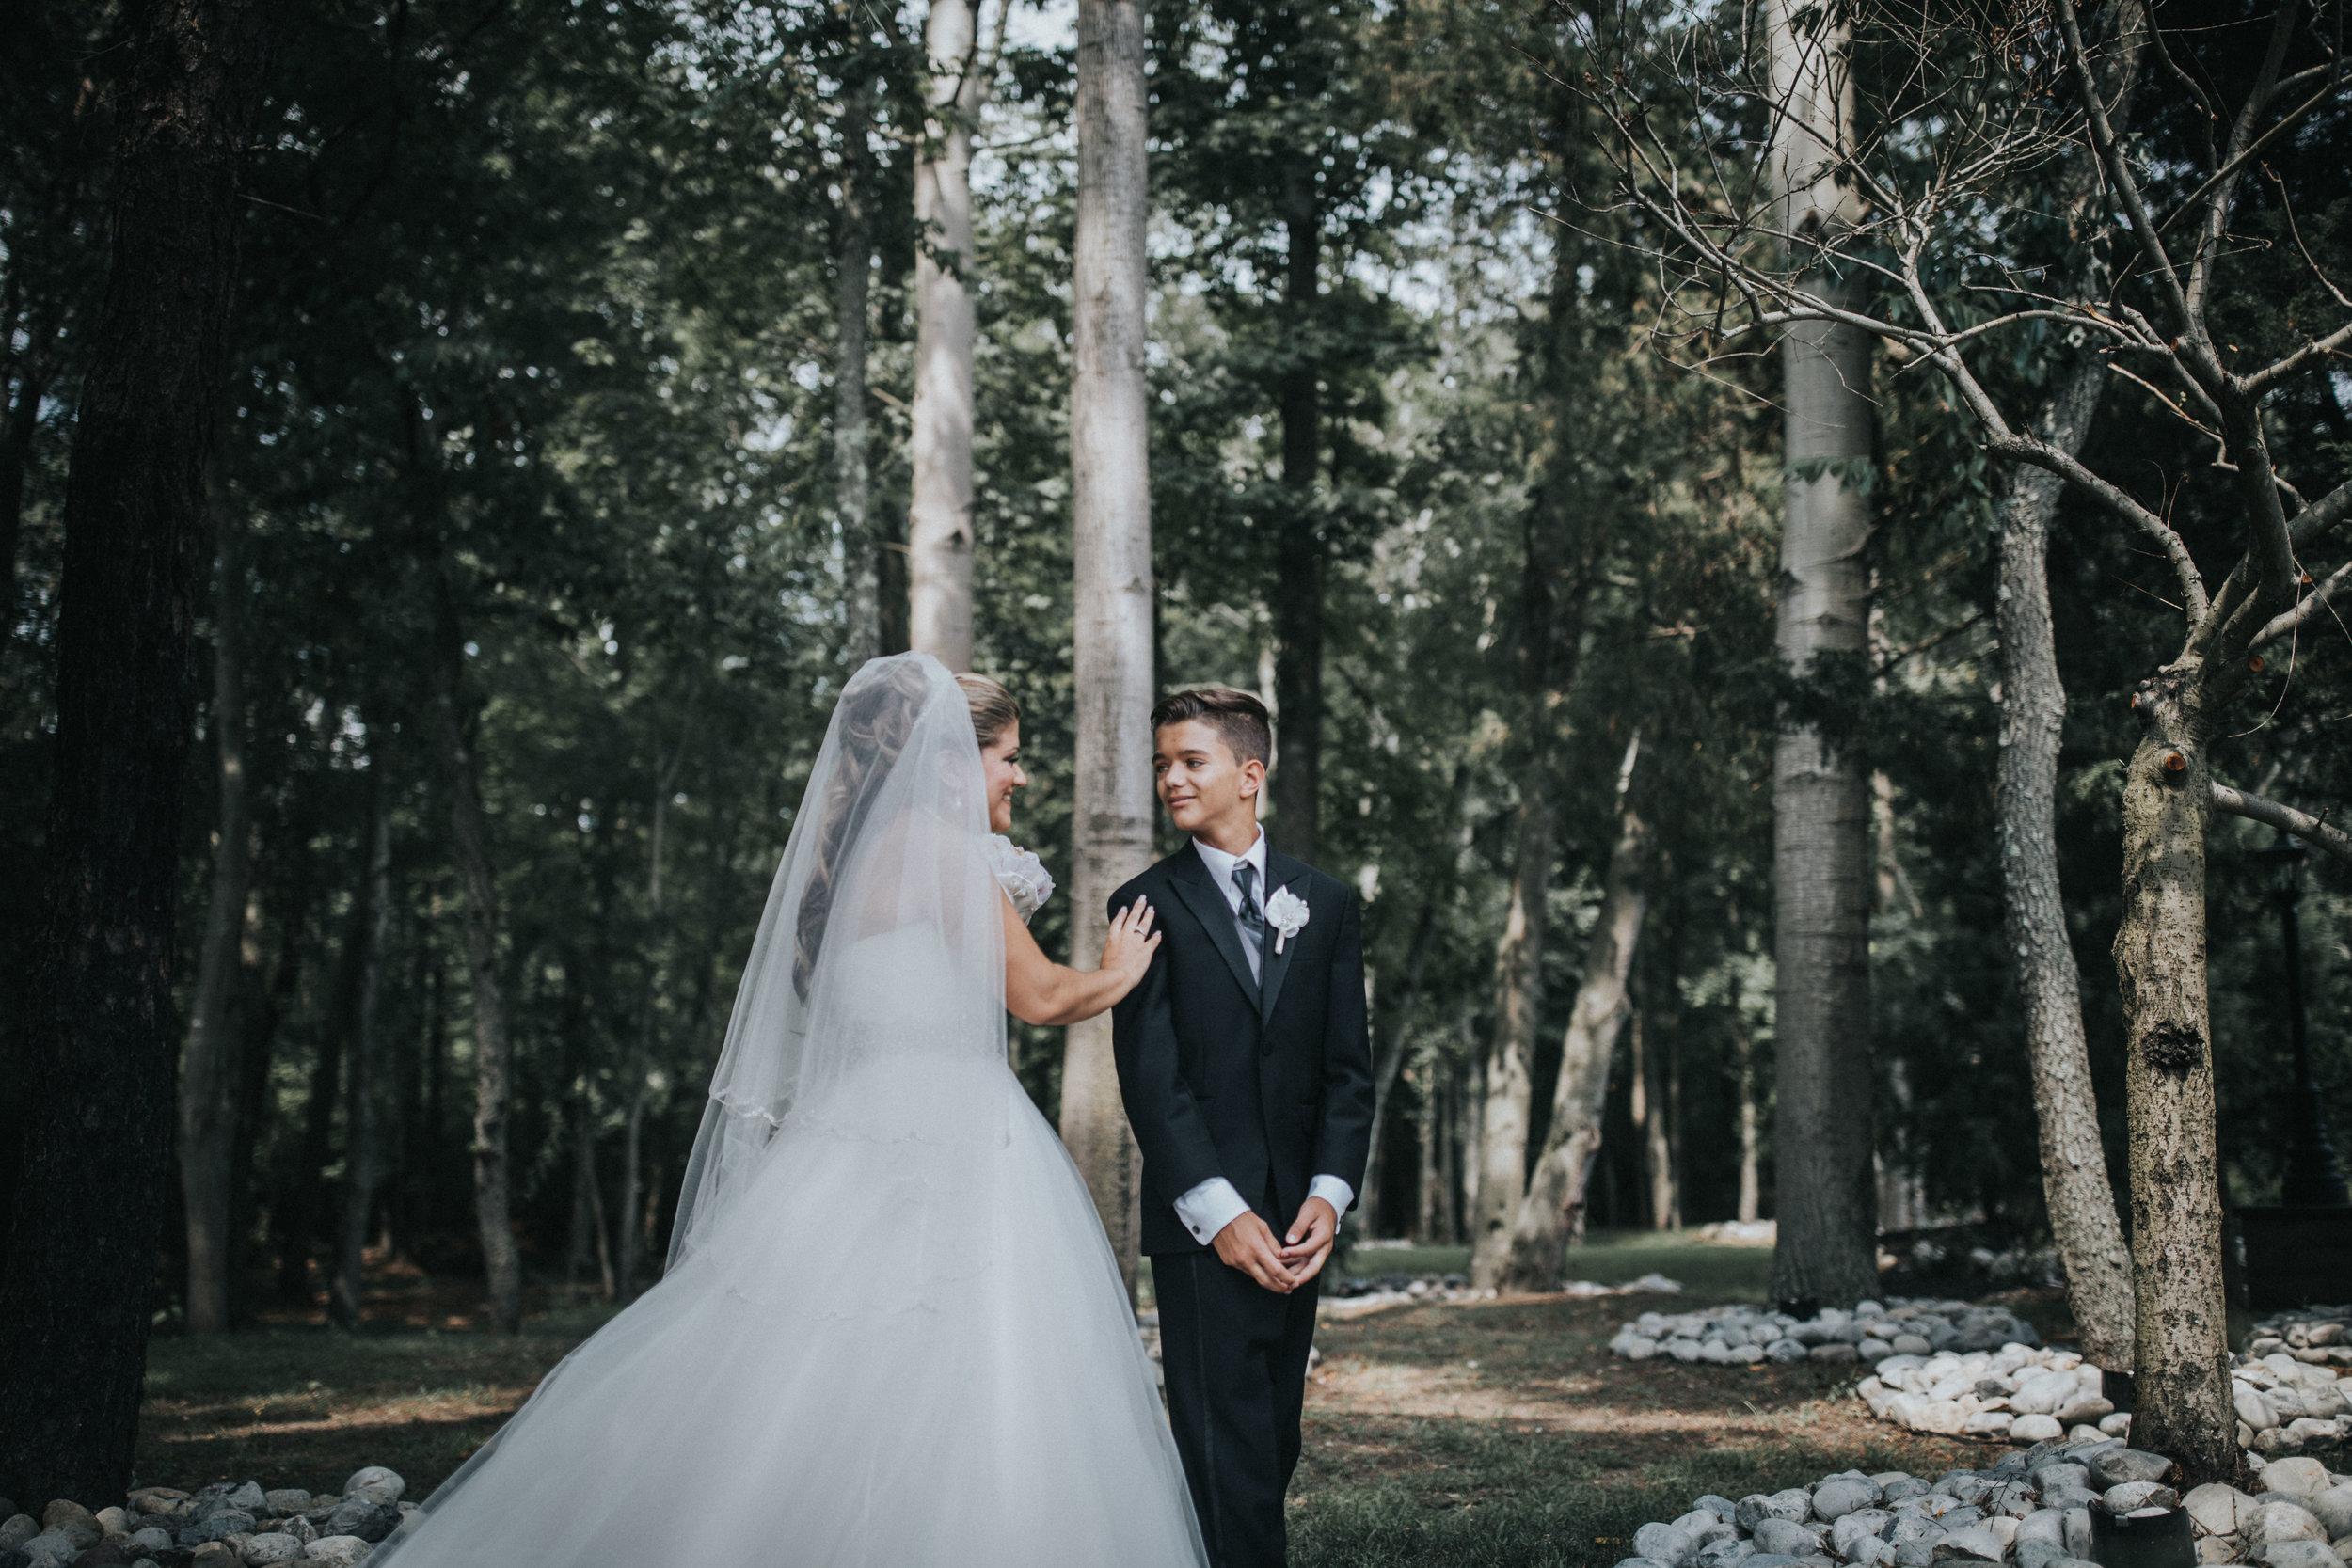 NewJersey_Wedding_Photography_Brigalias_First_Look_Tara&Pete-28.jpg